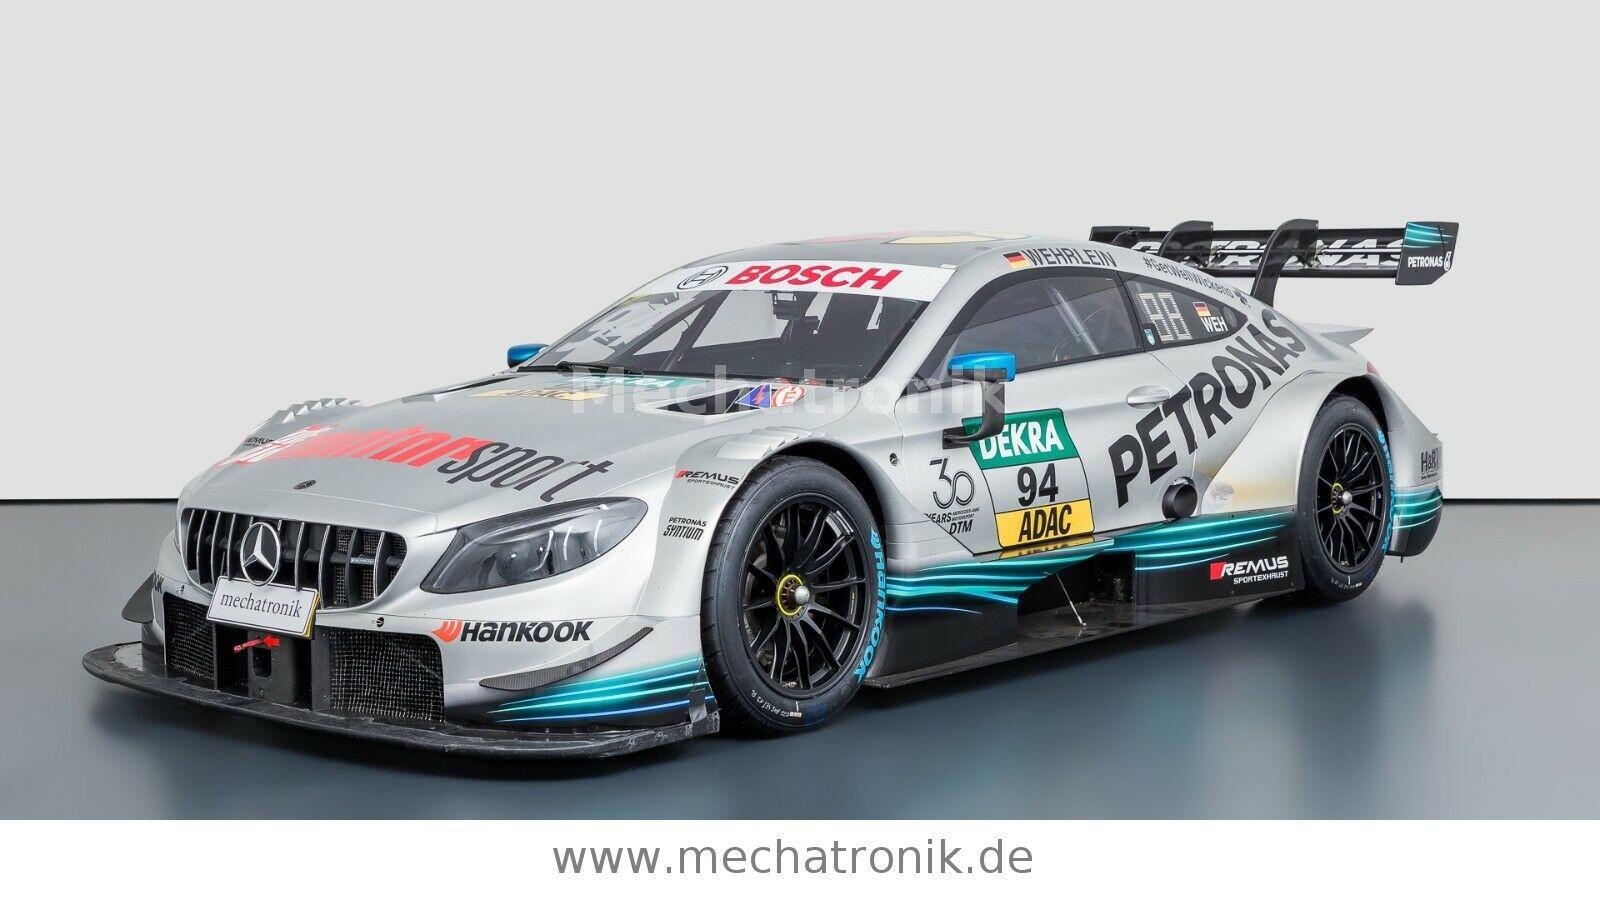 Mercedes-AMG C63 DTM price